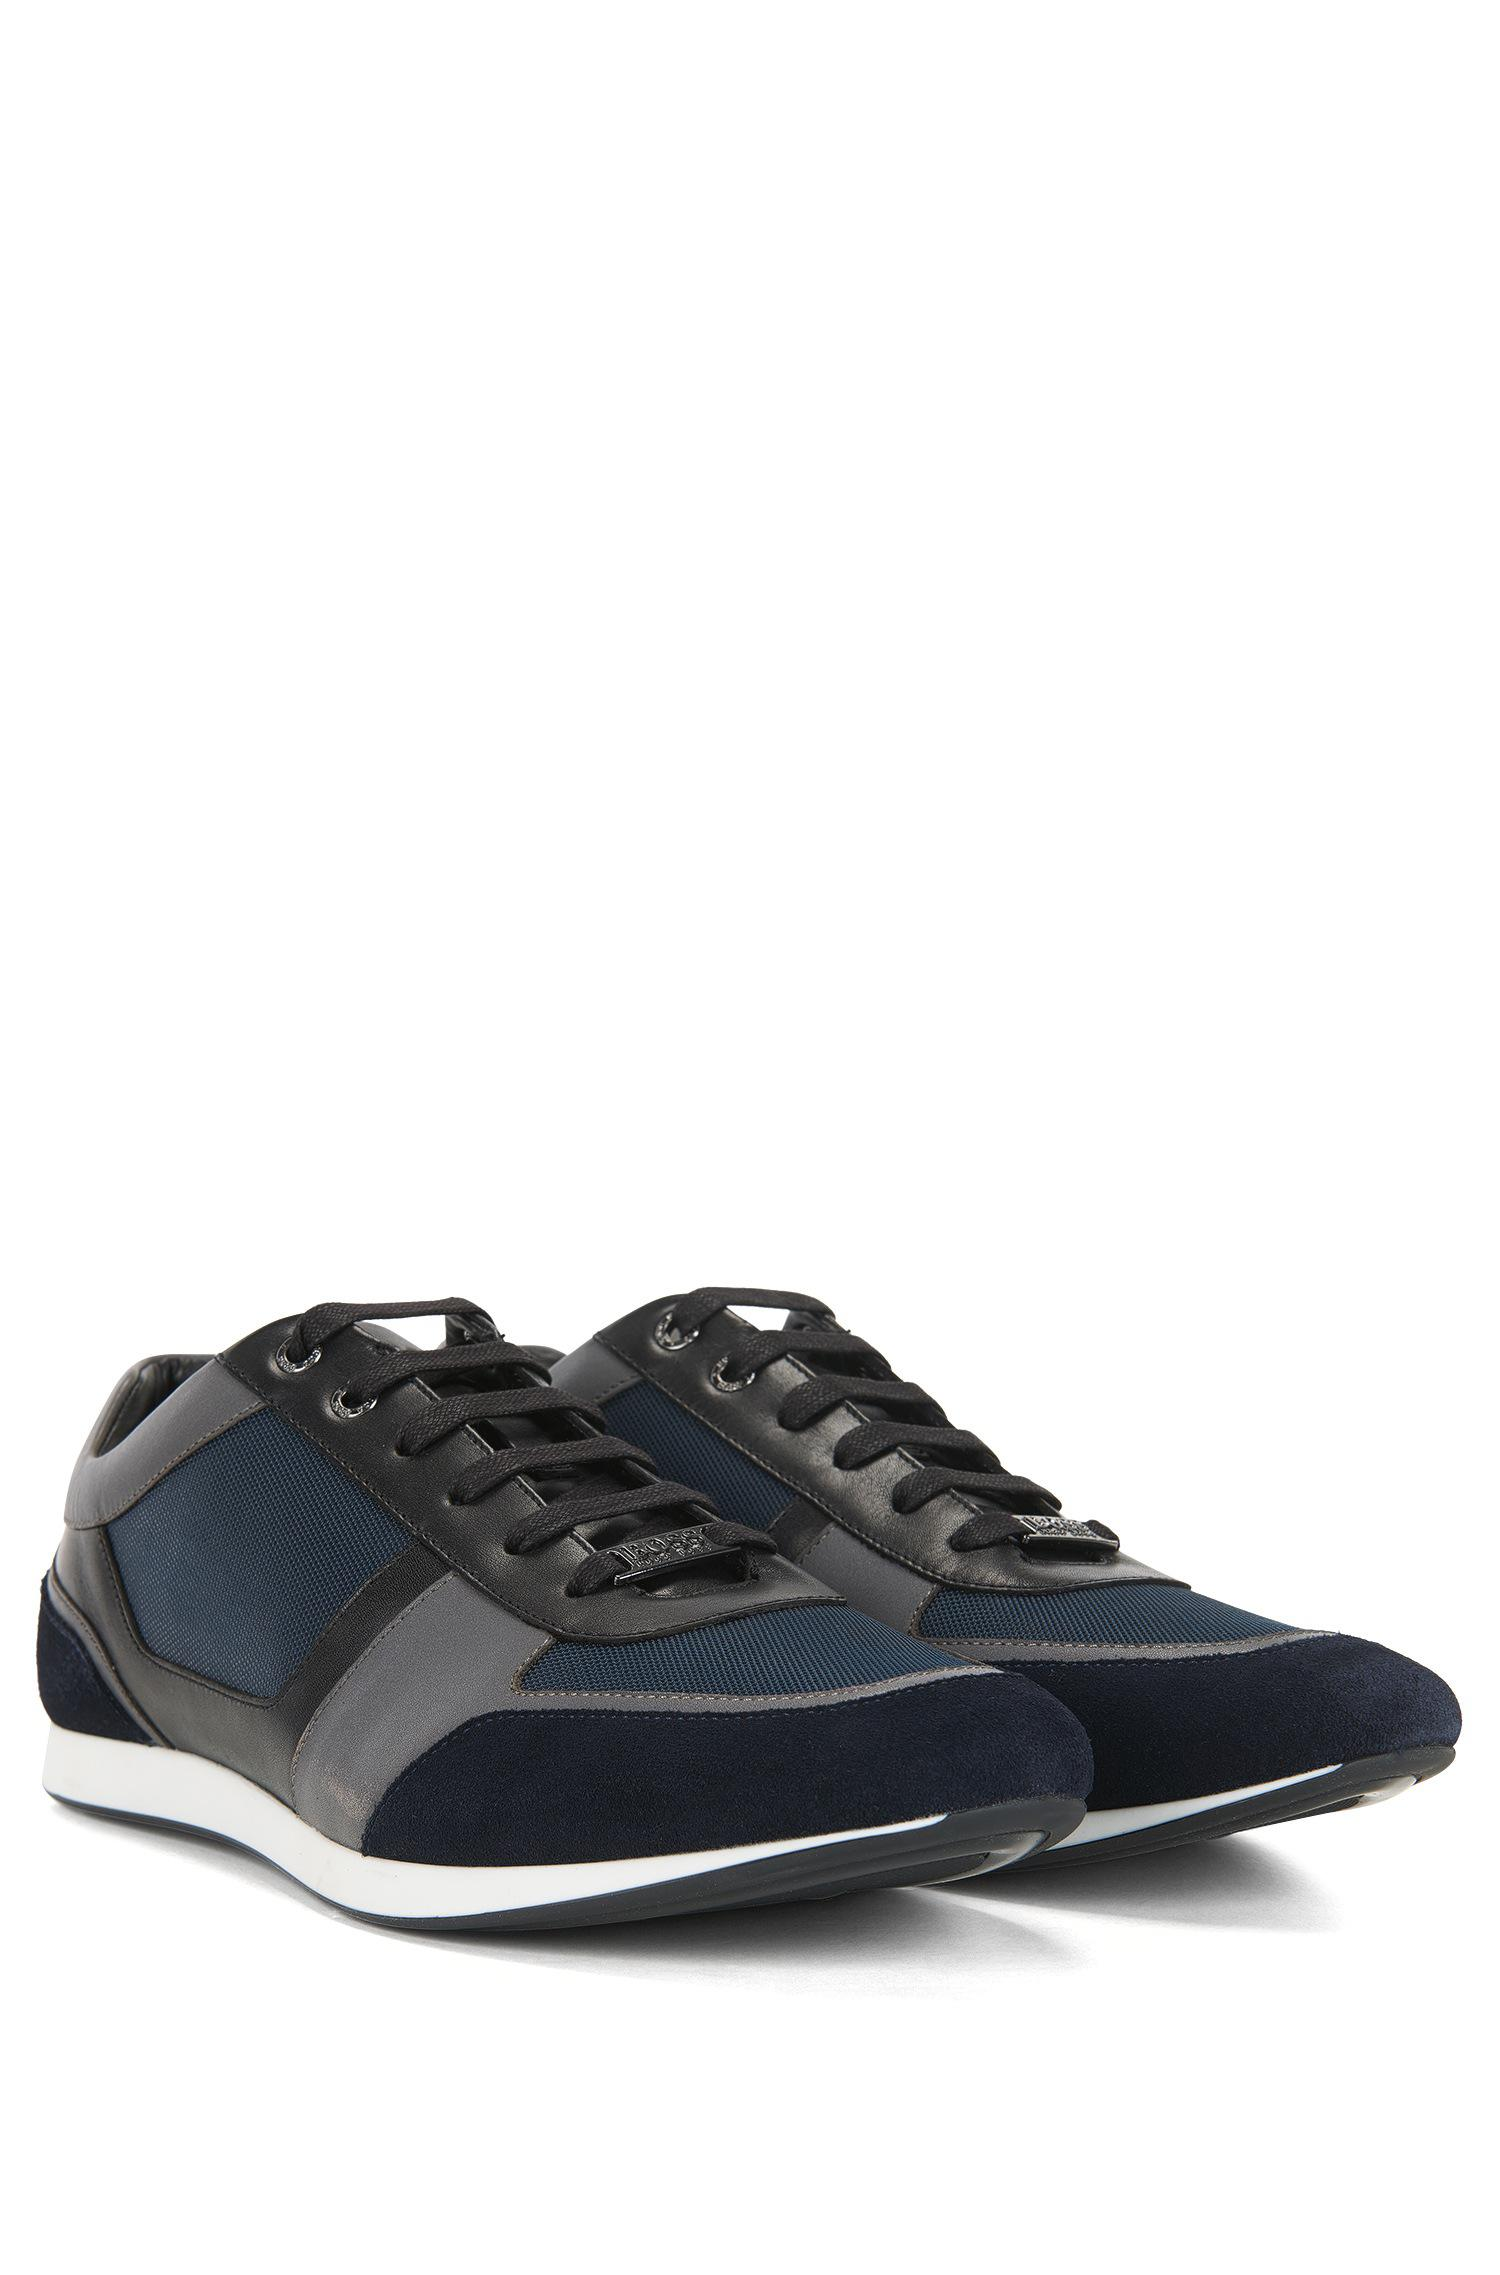 LAKE - Sneaker low - dark blue 8lG4ta